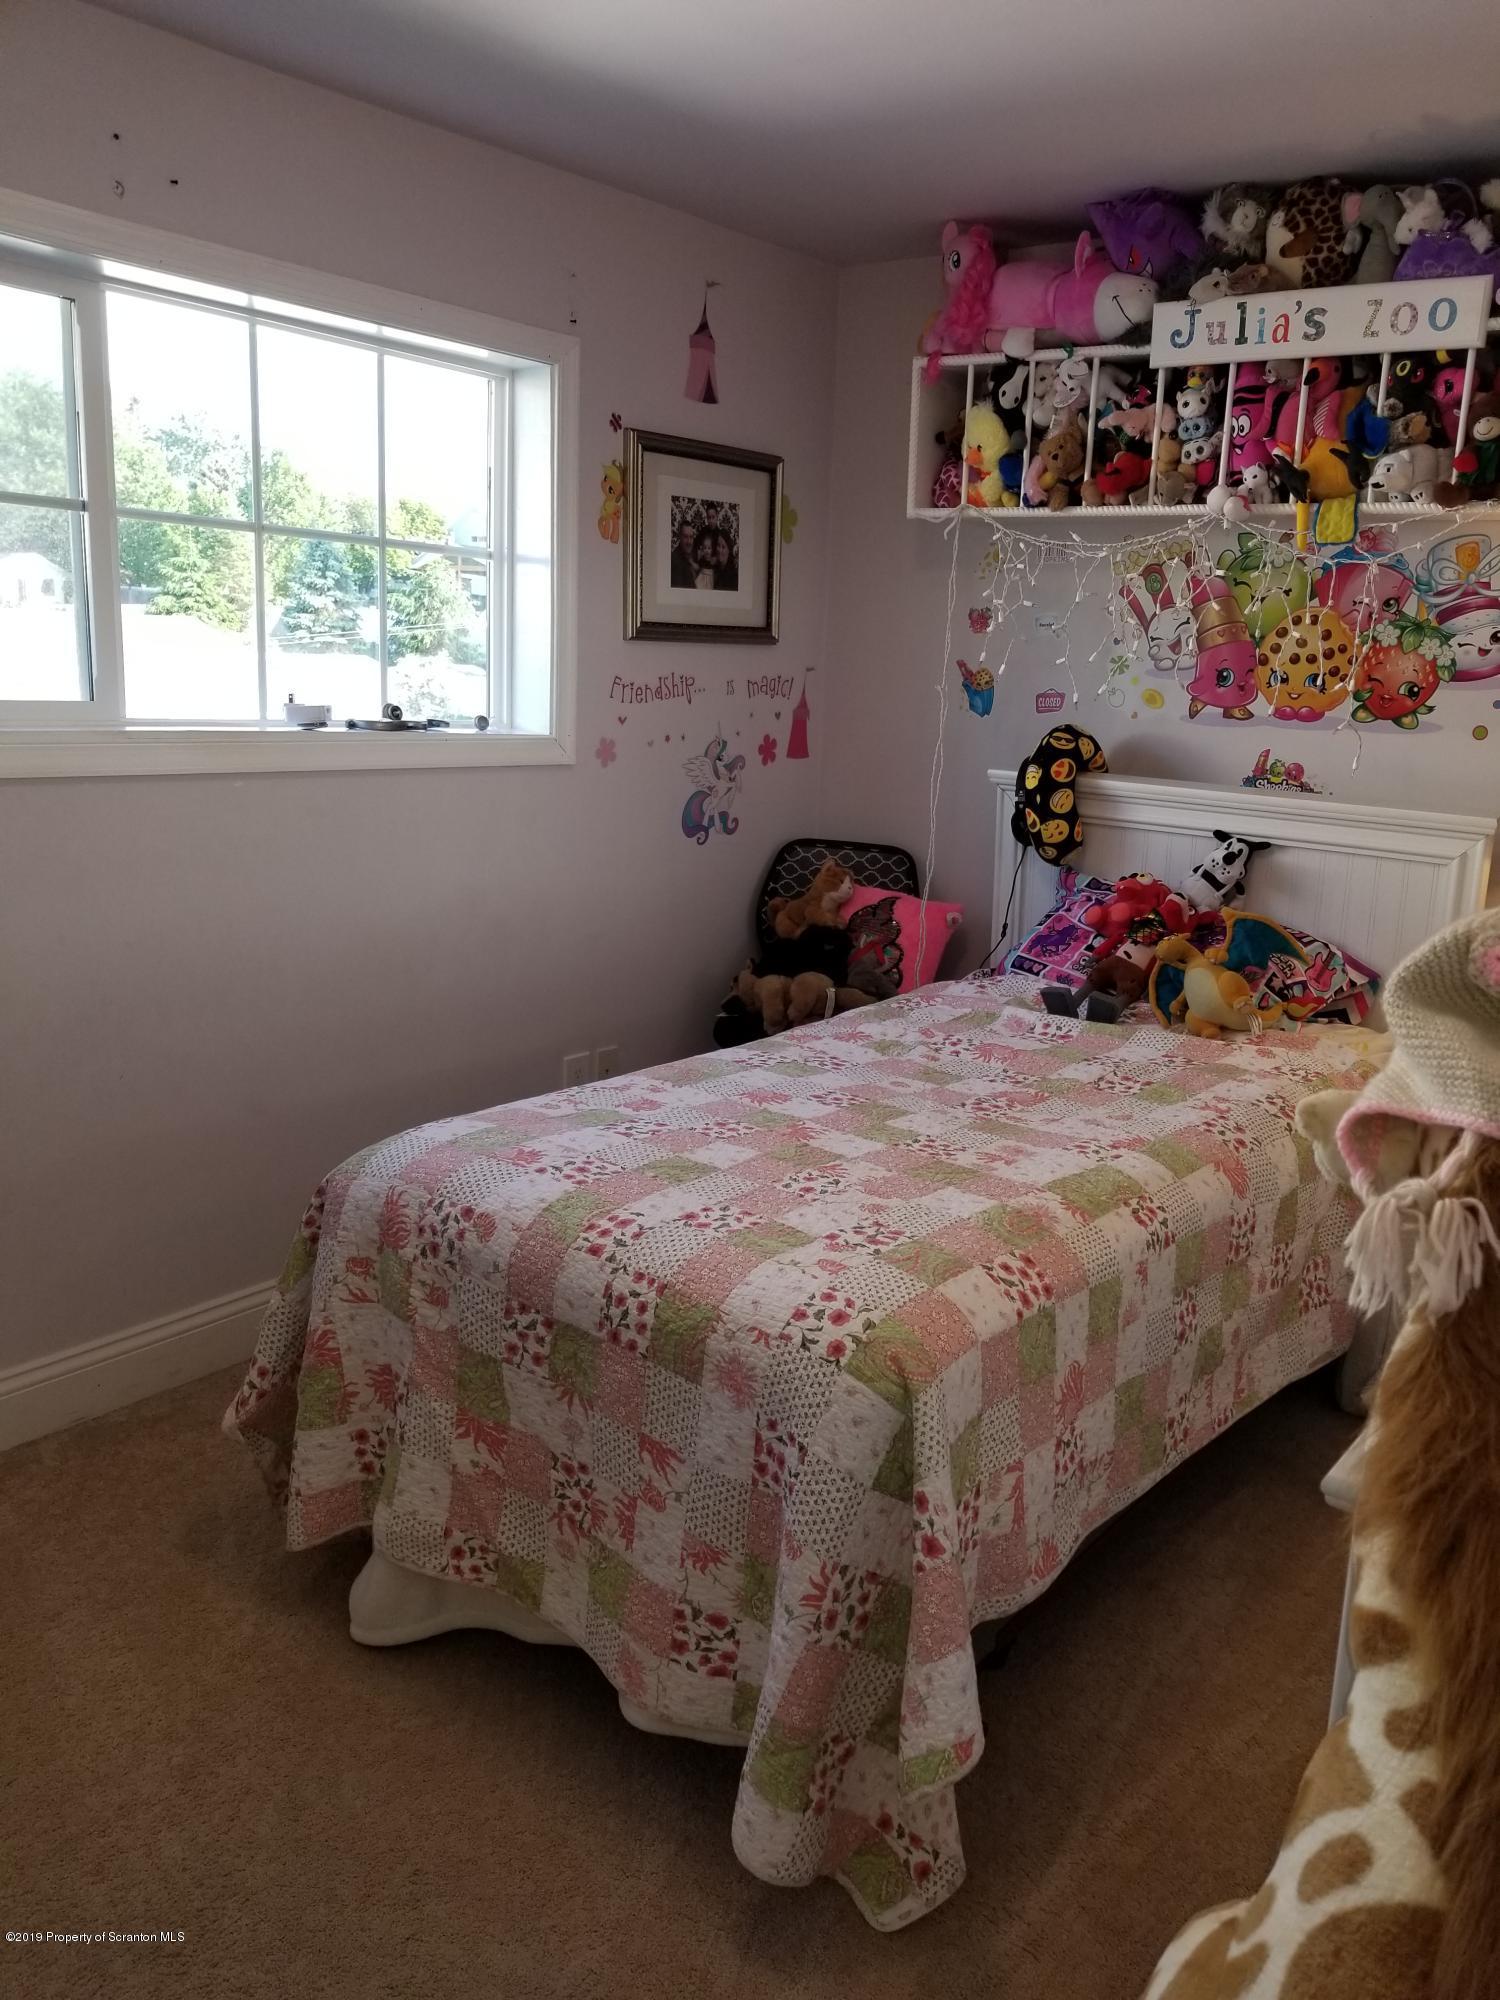 712 Sherwood Ave, Dunmore, Pennsylvania 18512, 3 Bedrooms Bedrooms, 5 Rooms Rooms,1 BathroomBathrooms,Single Family,For Sale,Sherwood,19-2723